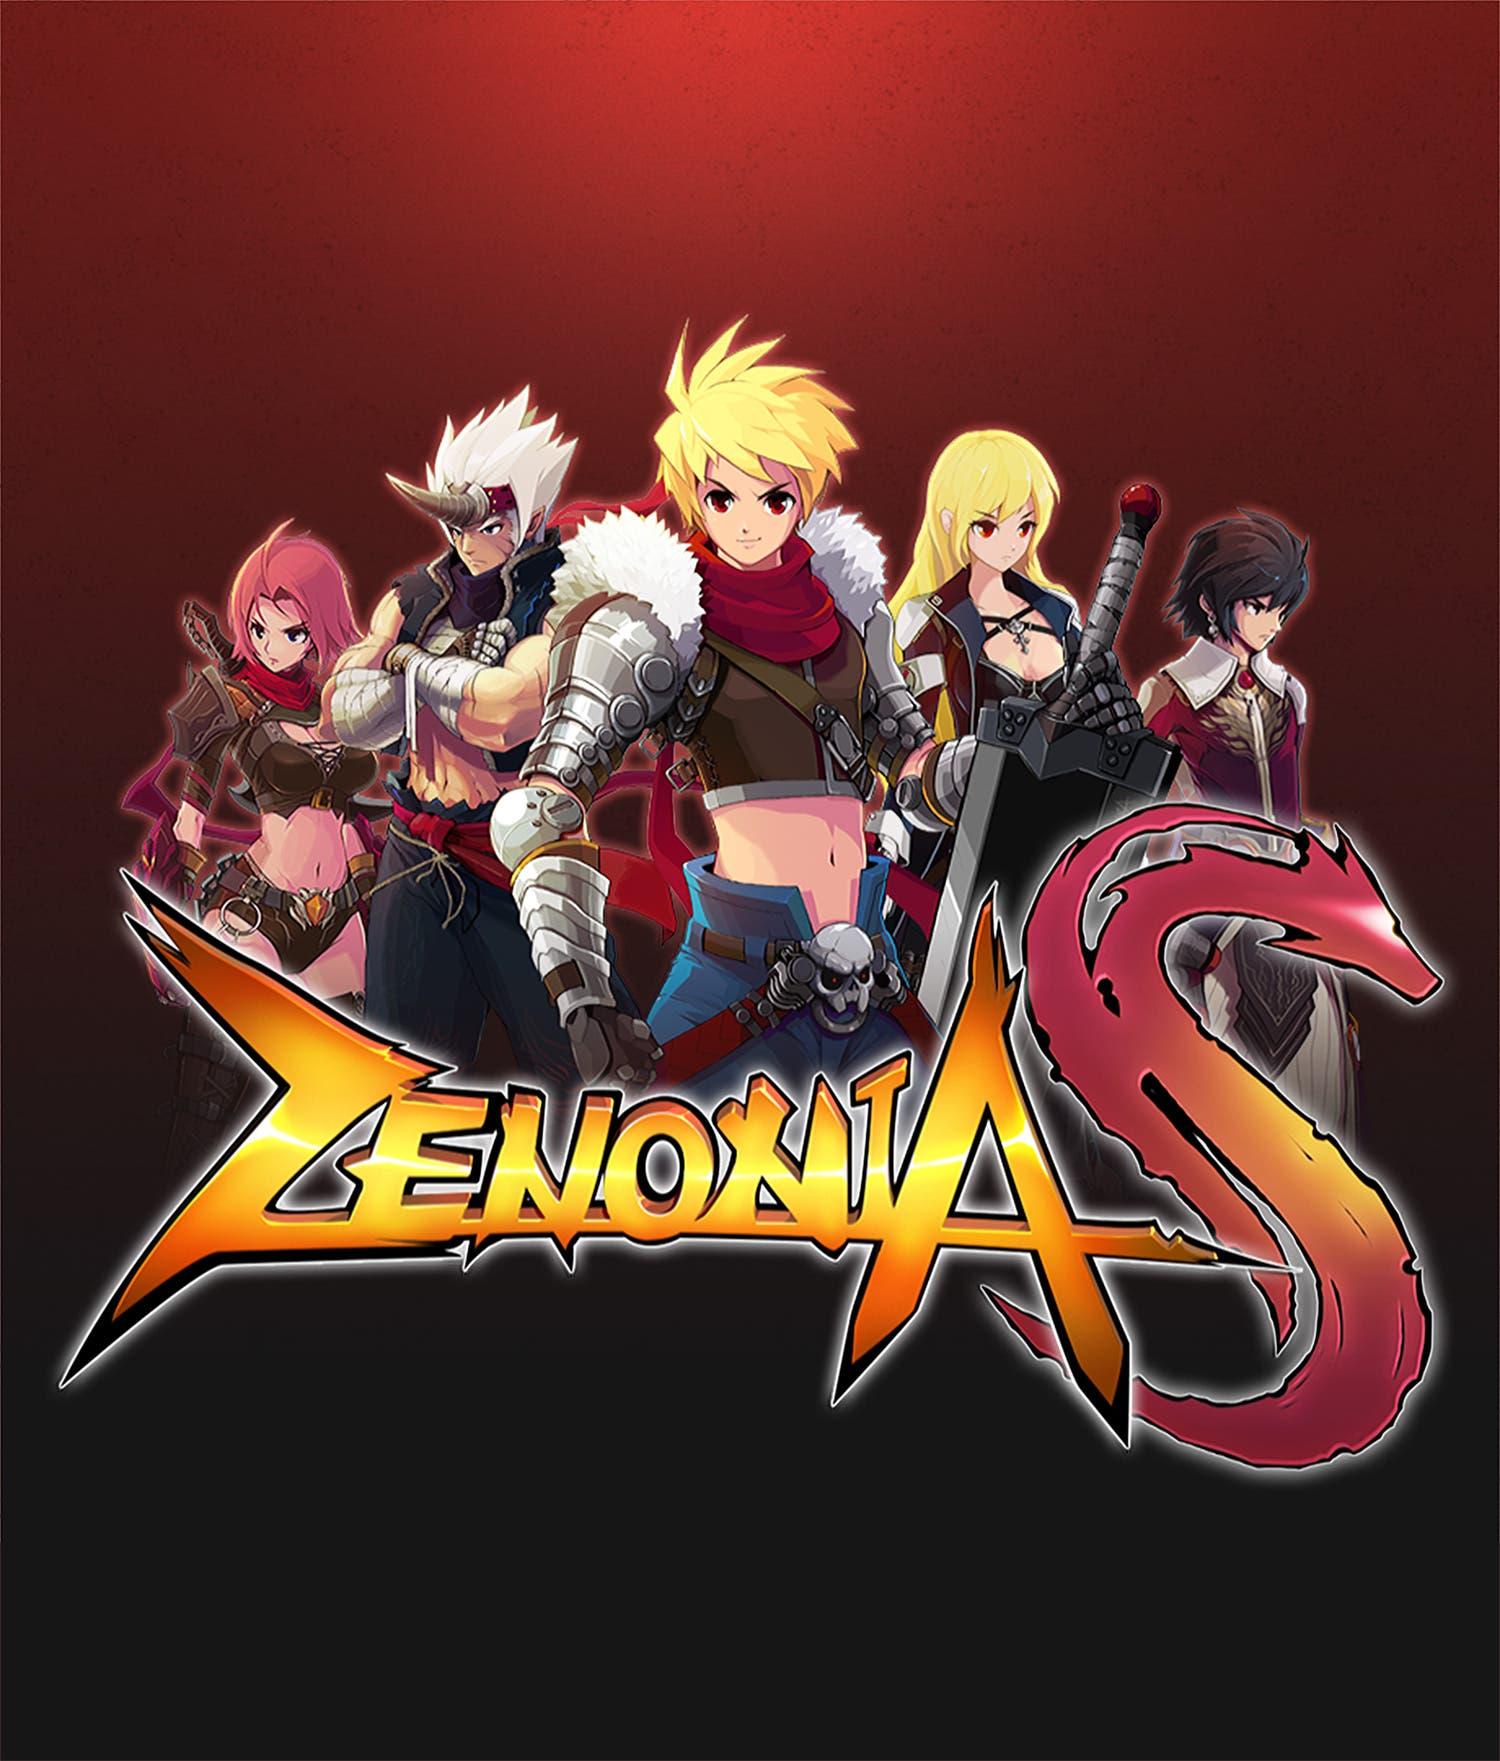 Zenonia S Promo Bild